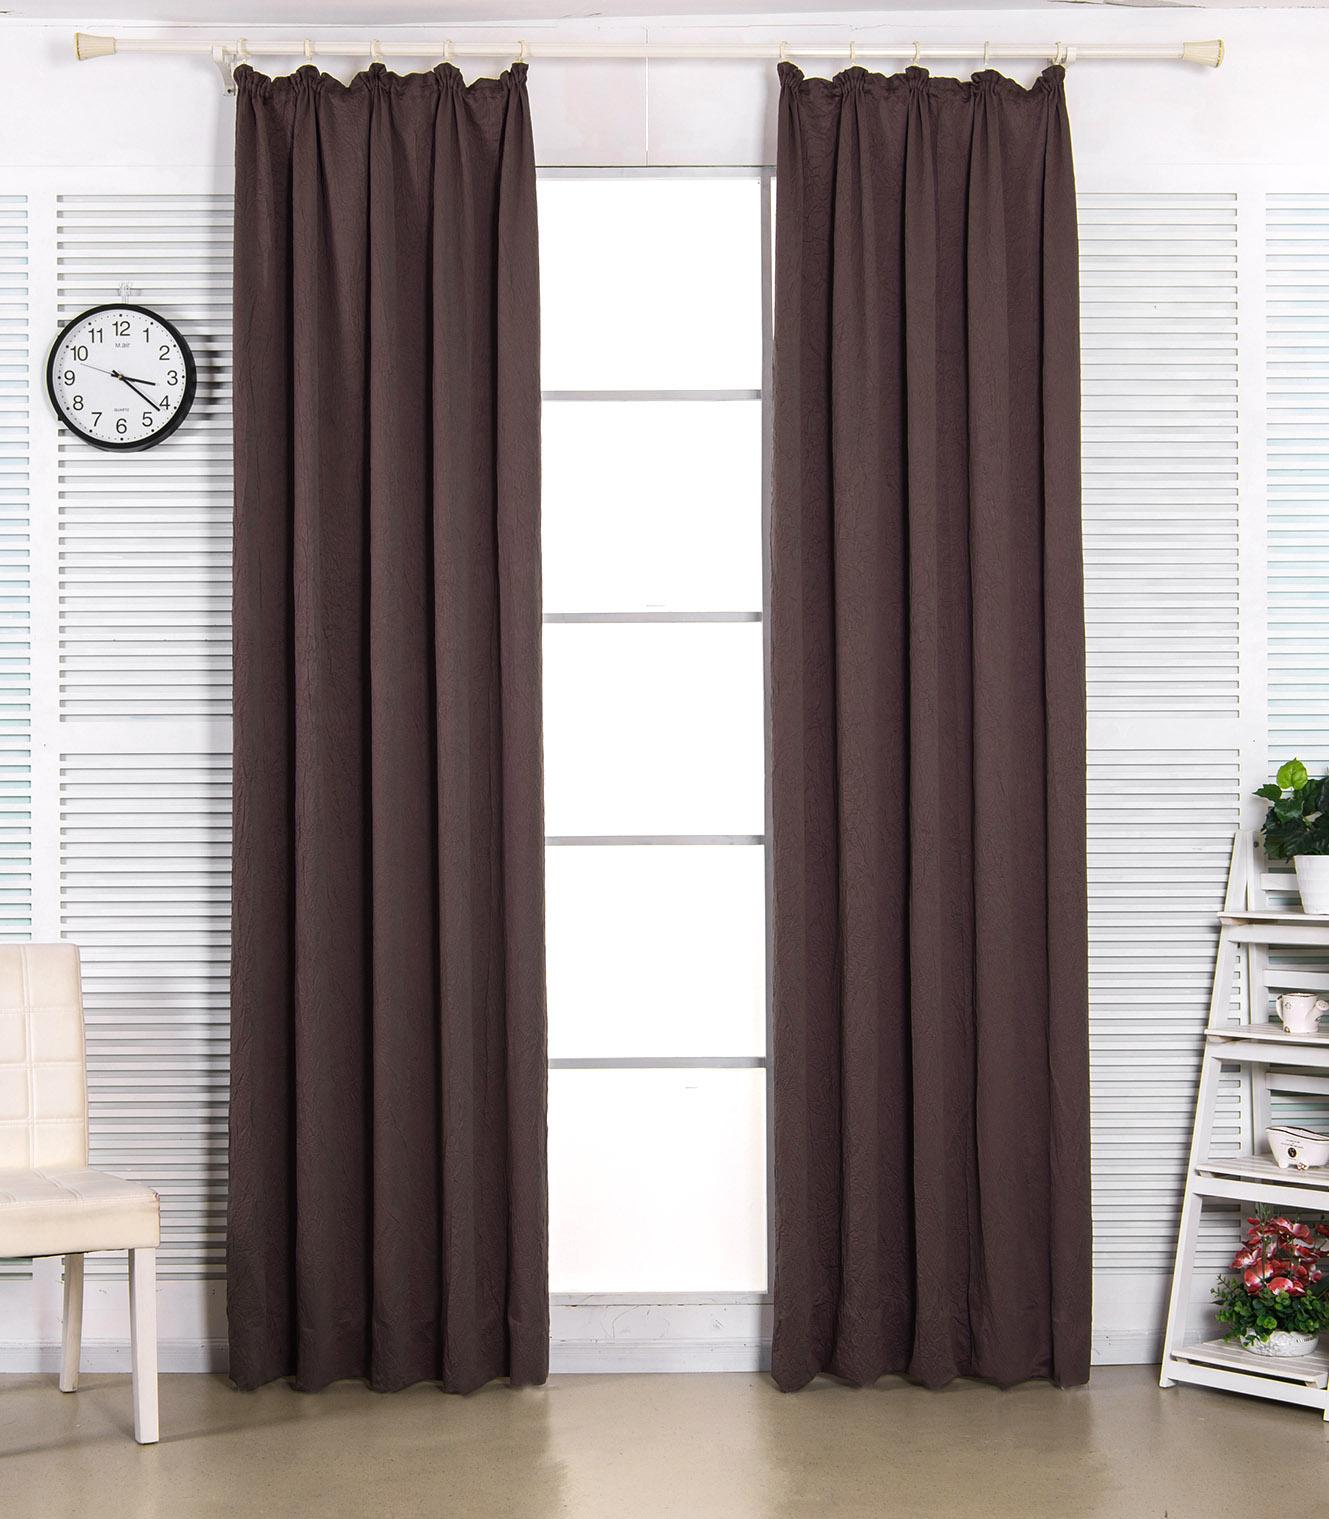 2er set gardinen vorh nge blickdicht kr uselband 135x245cm braun crush vh5852br3 ebay. Black Bedroom Furniture Sets. Home Design Ideas